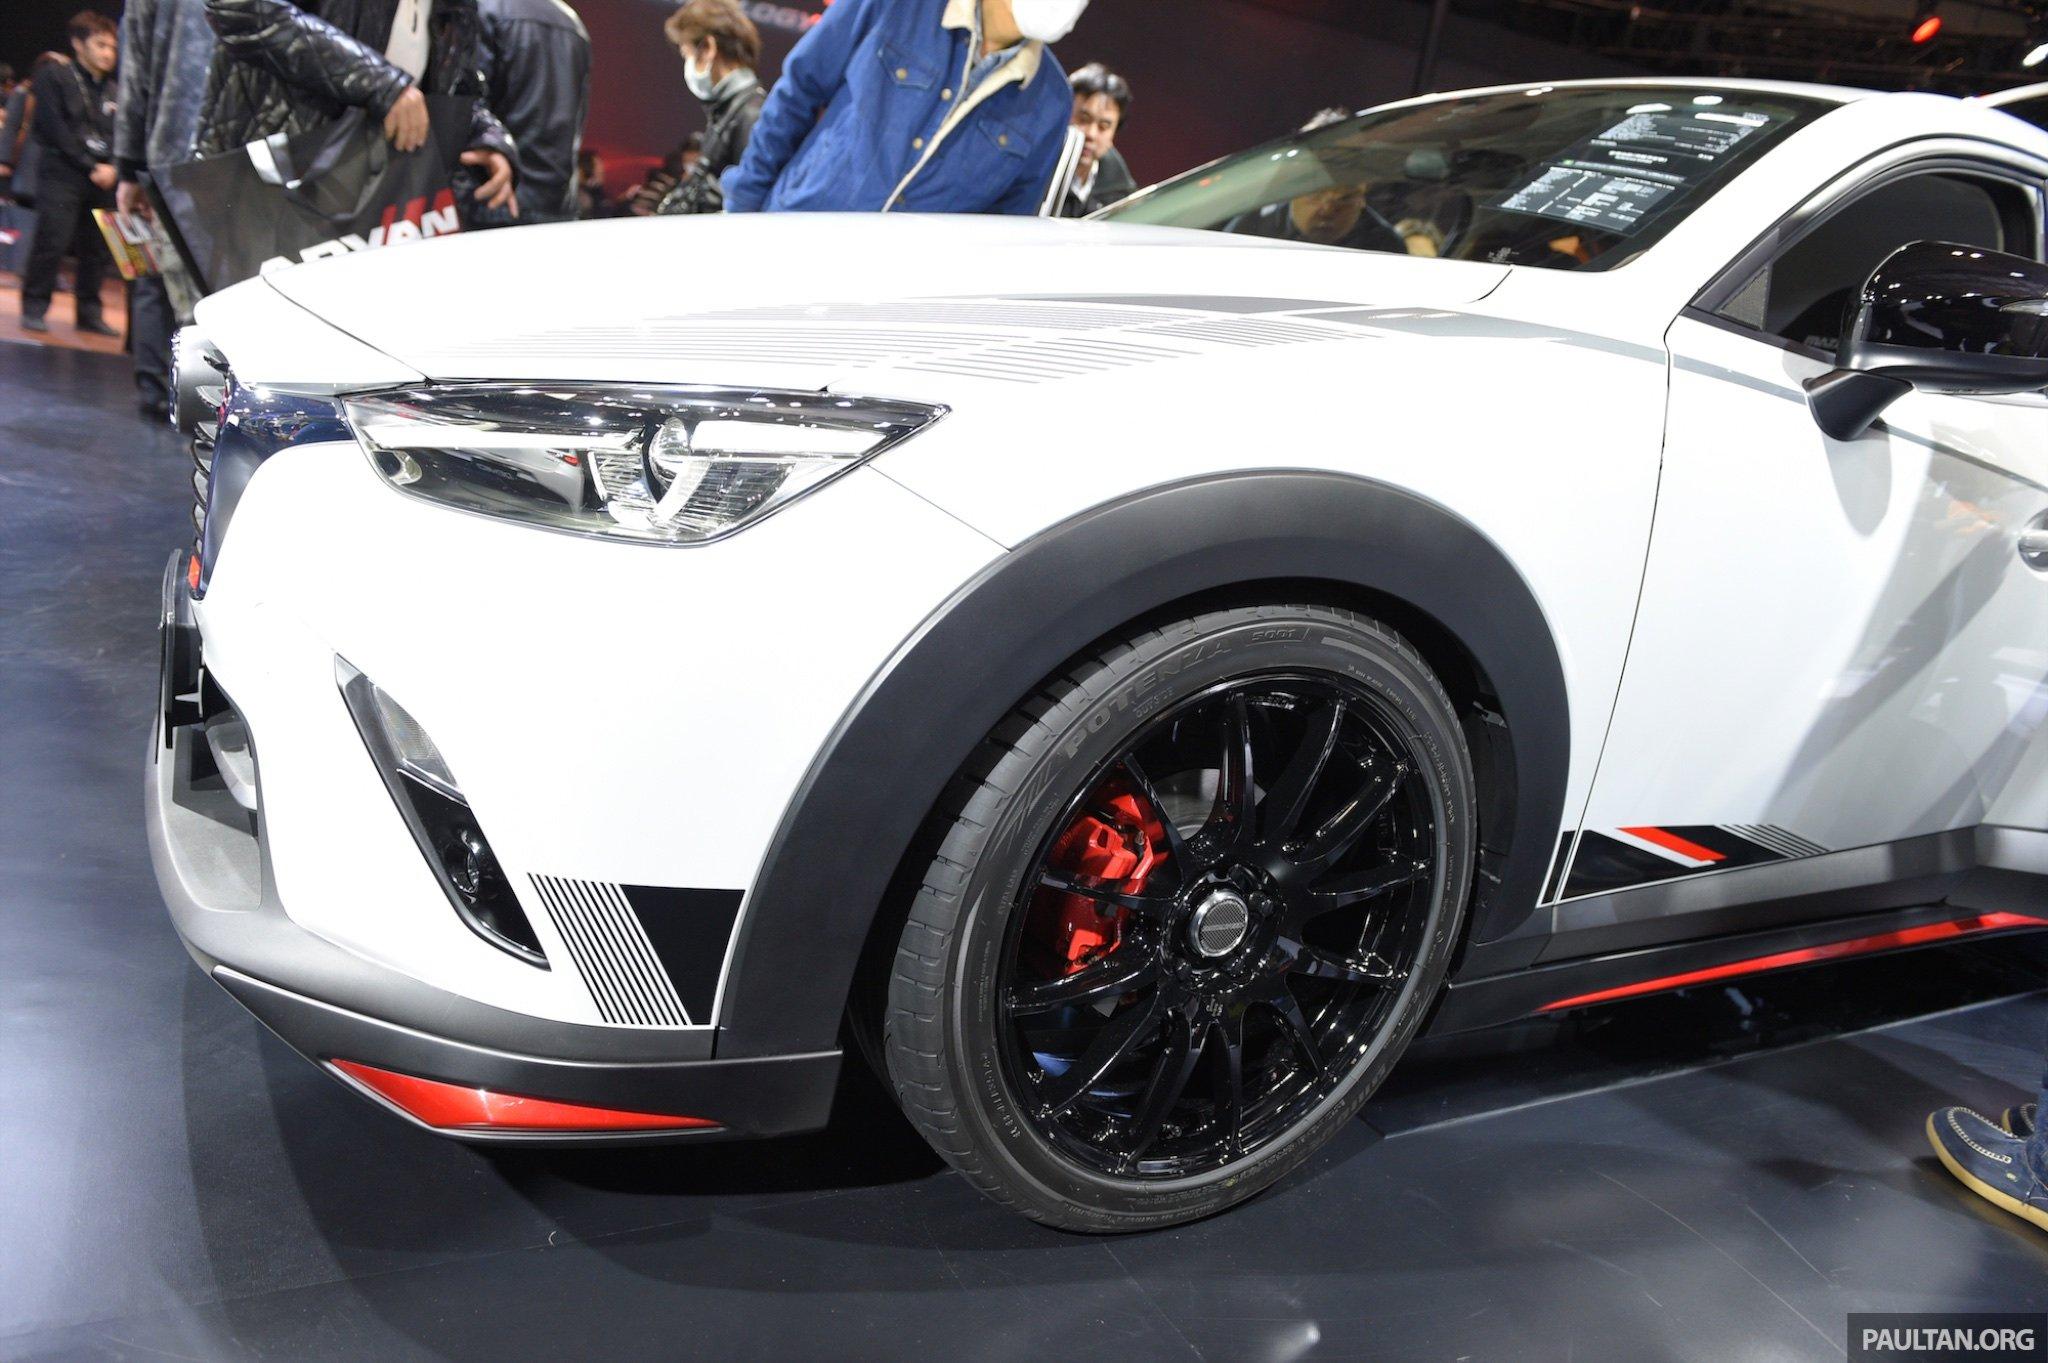 mazda cx 3 racing concept at 2015 tokyo auto salon paul. Black Bedroom Furniture Sets. Home Design Ideas